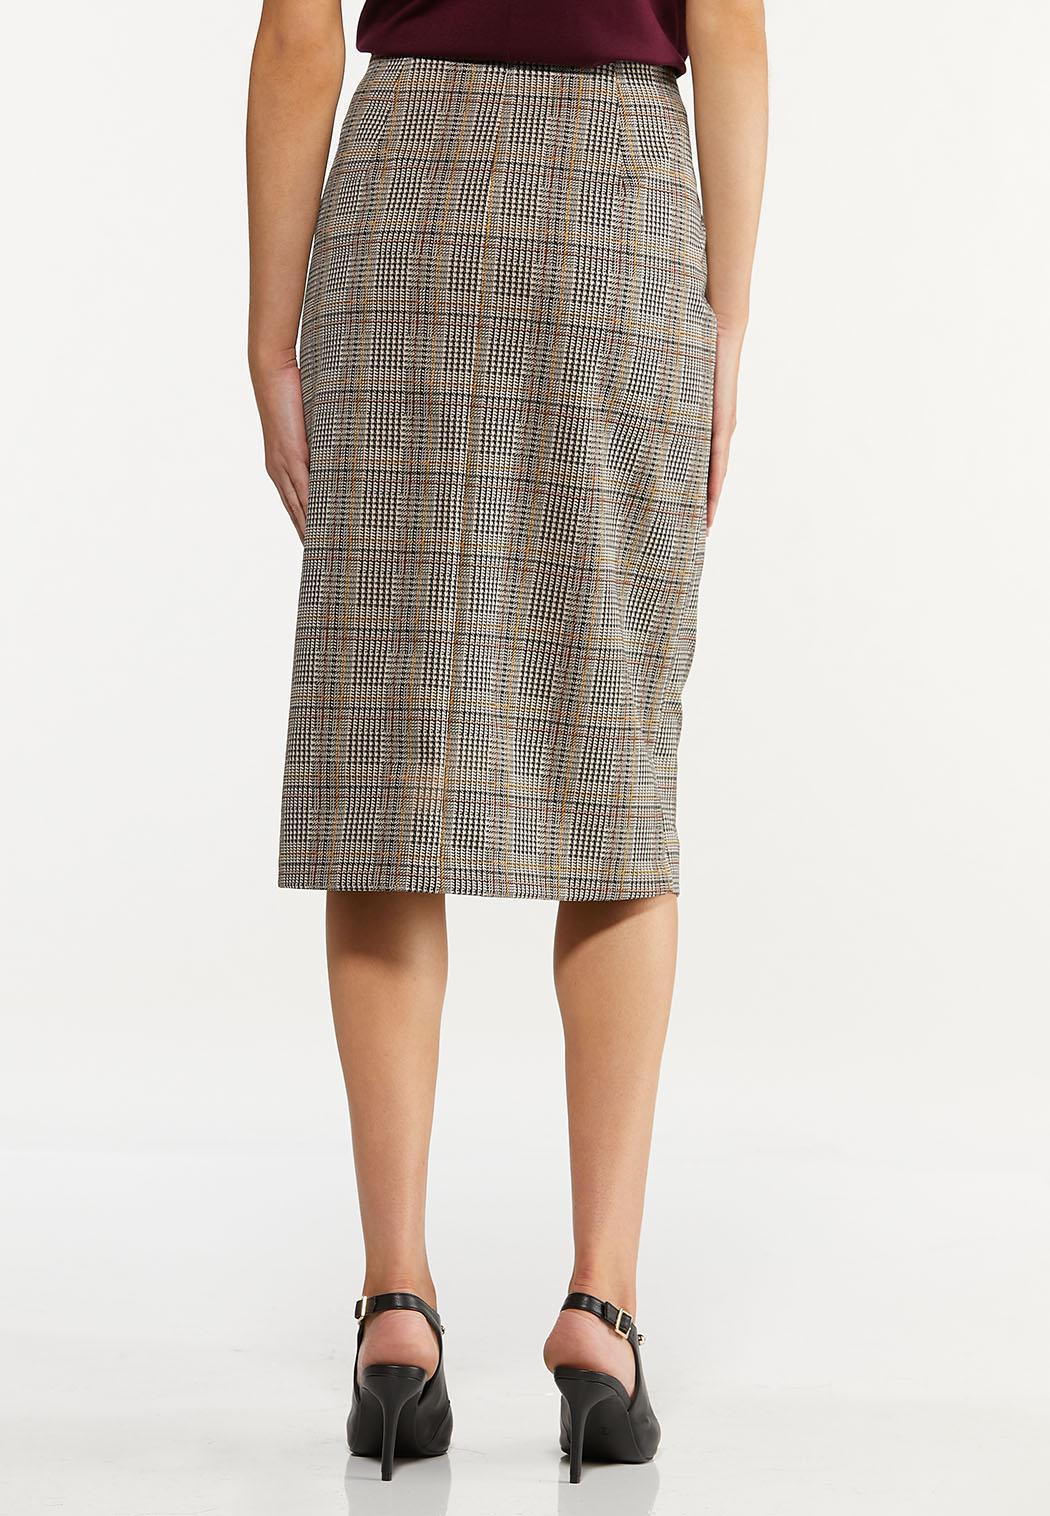 Jacquard Pencil Skirt (Item #44645822)